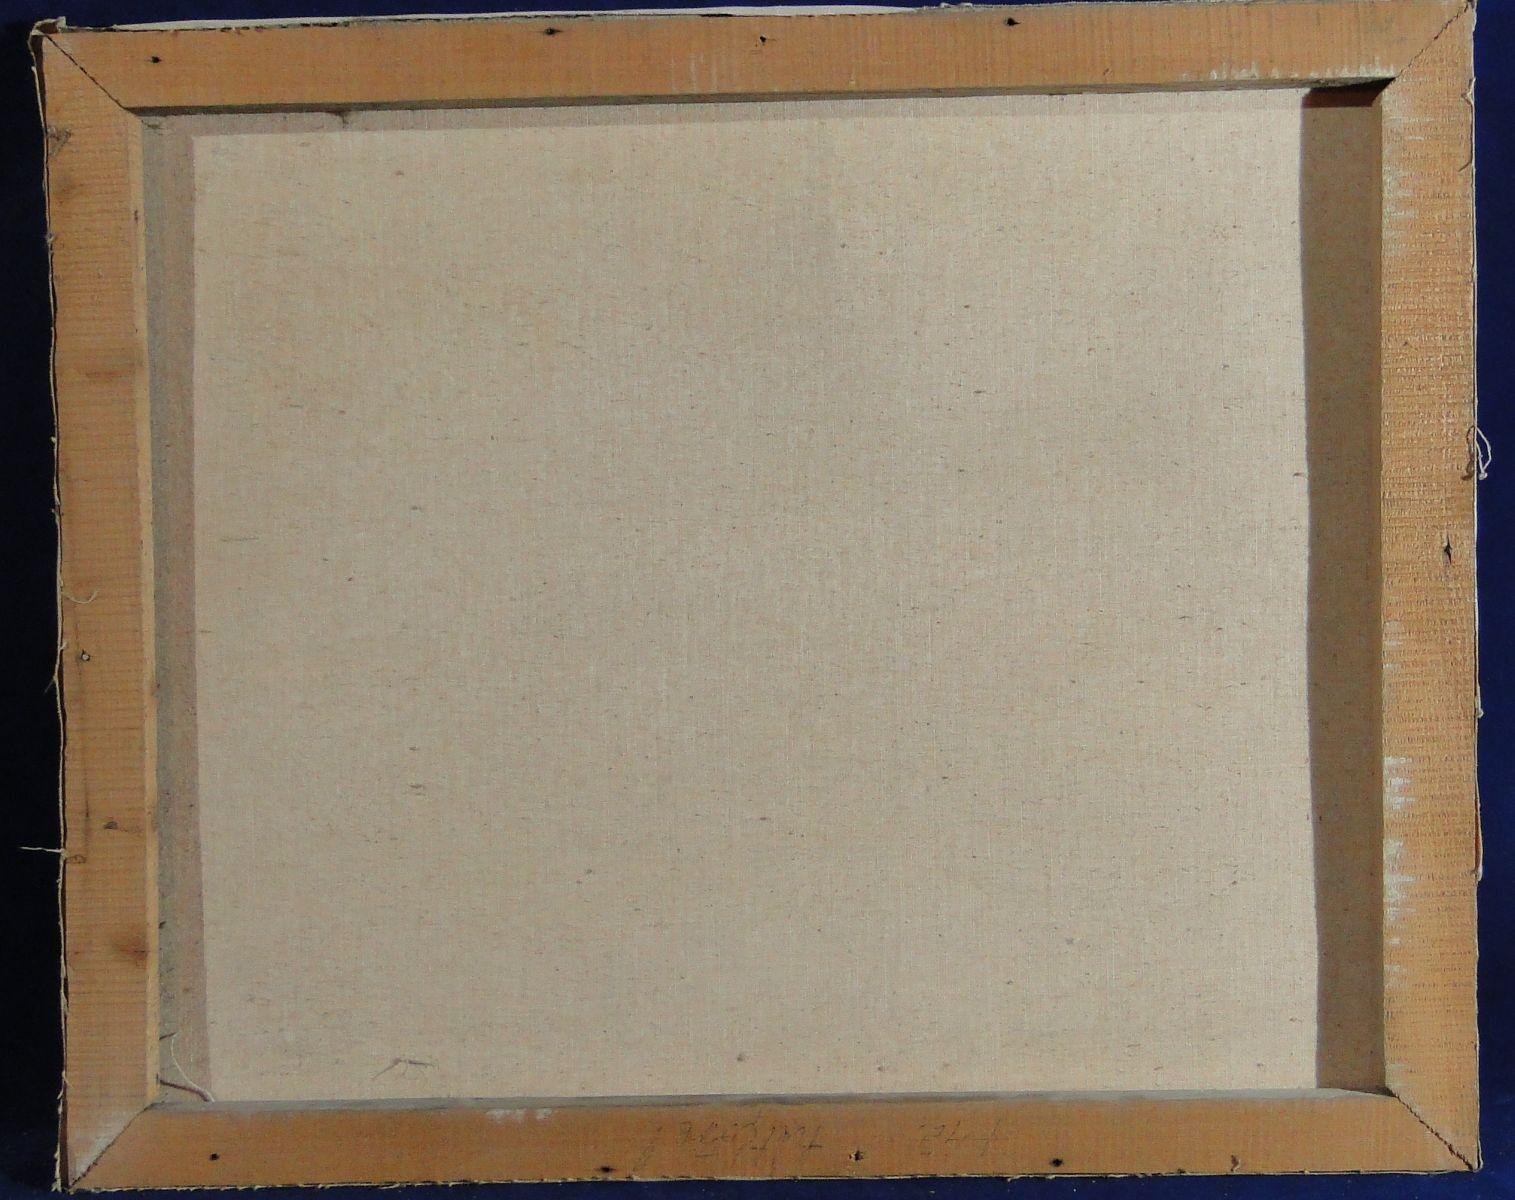 DSC03650.JPG (1515×1200)